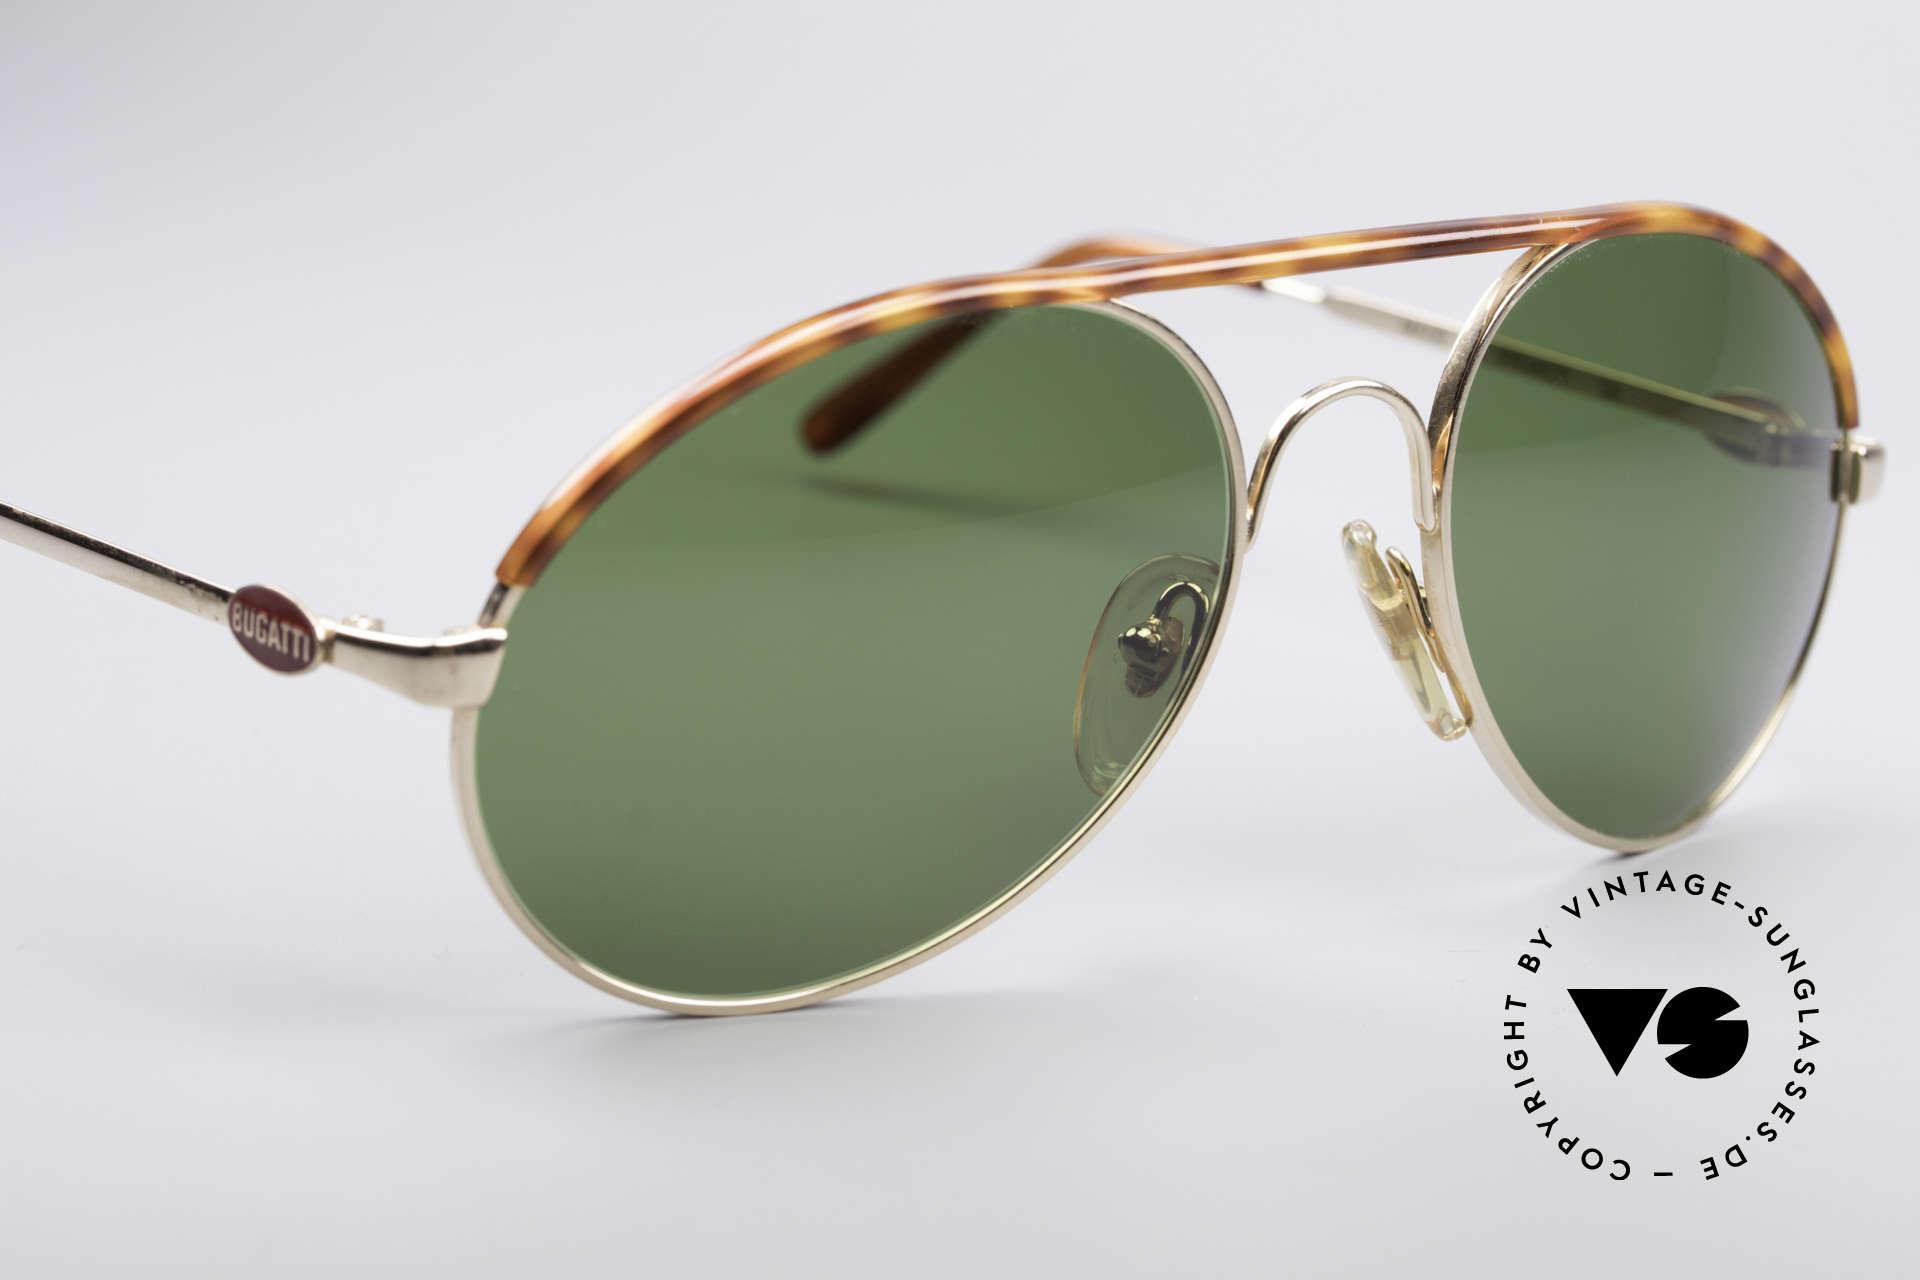 Bugatti 65986 Men's 80's Sunglasses, unworn (like all our vintage Bugatti eyewear), Made for Men